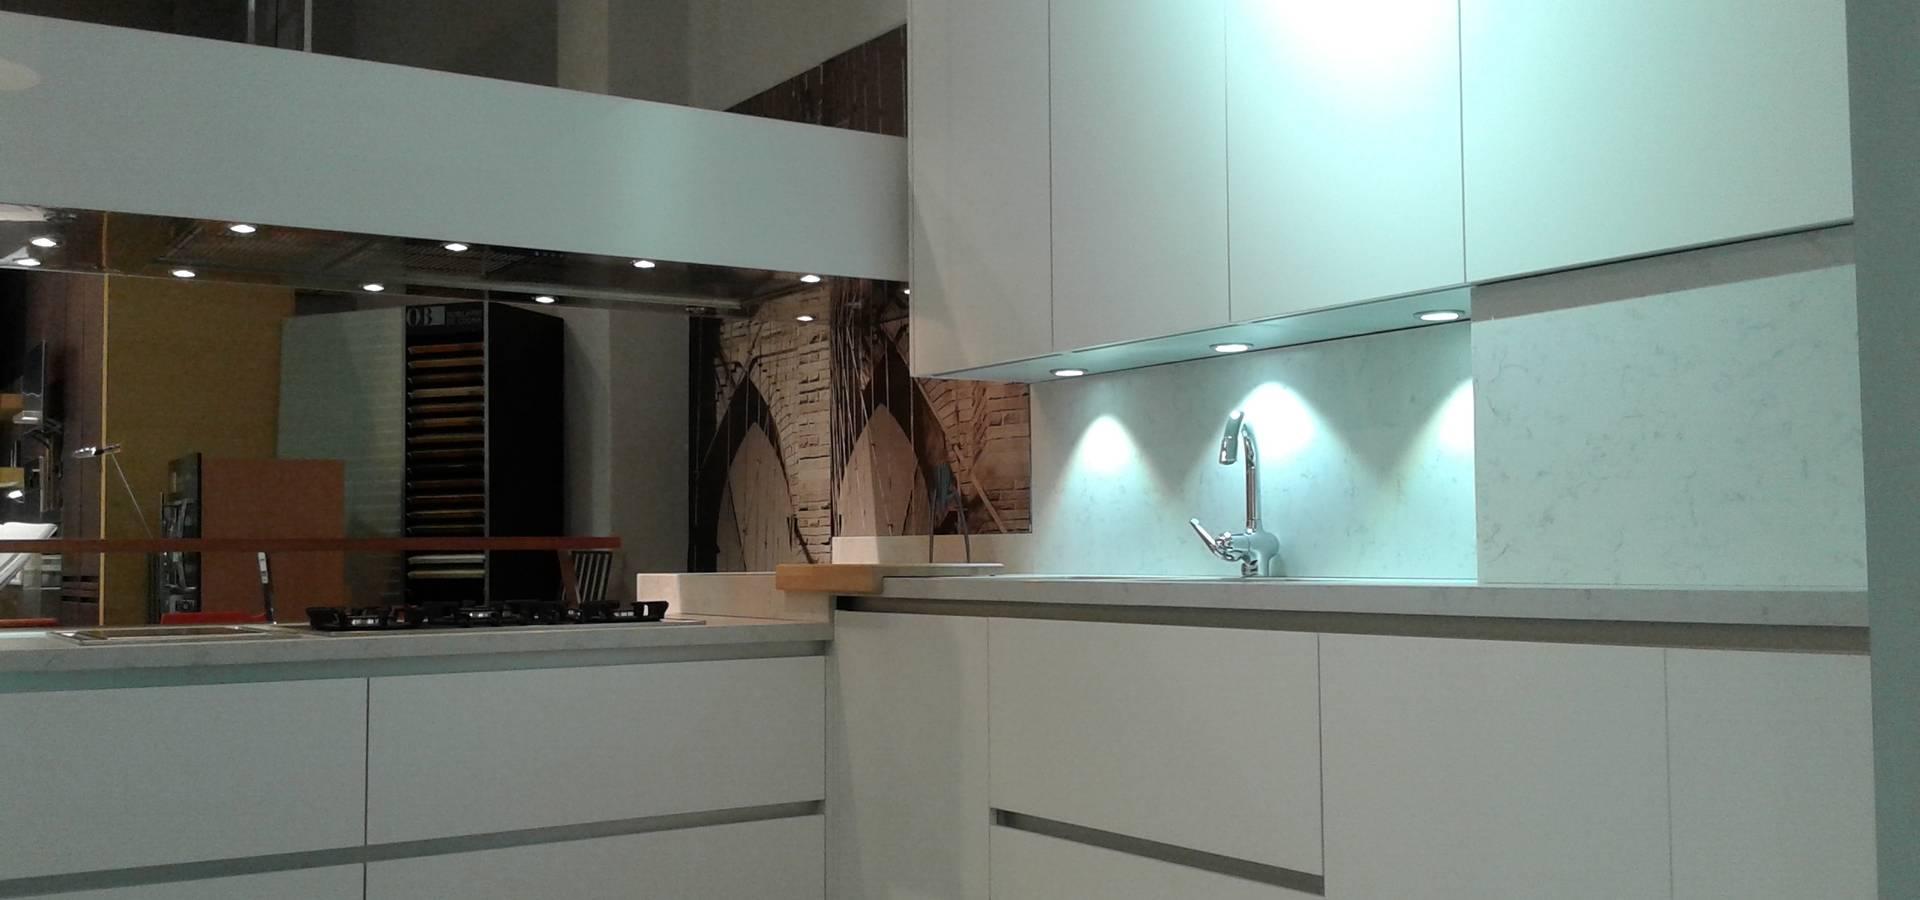 Tg kitchenambient dise adores de cocinas en barcelona - Disenadores de cocinas ...